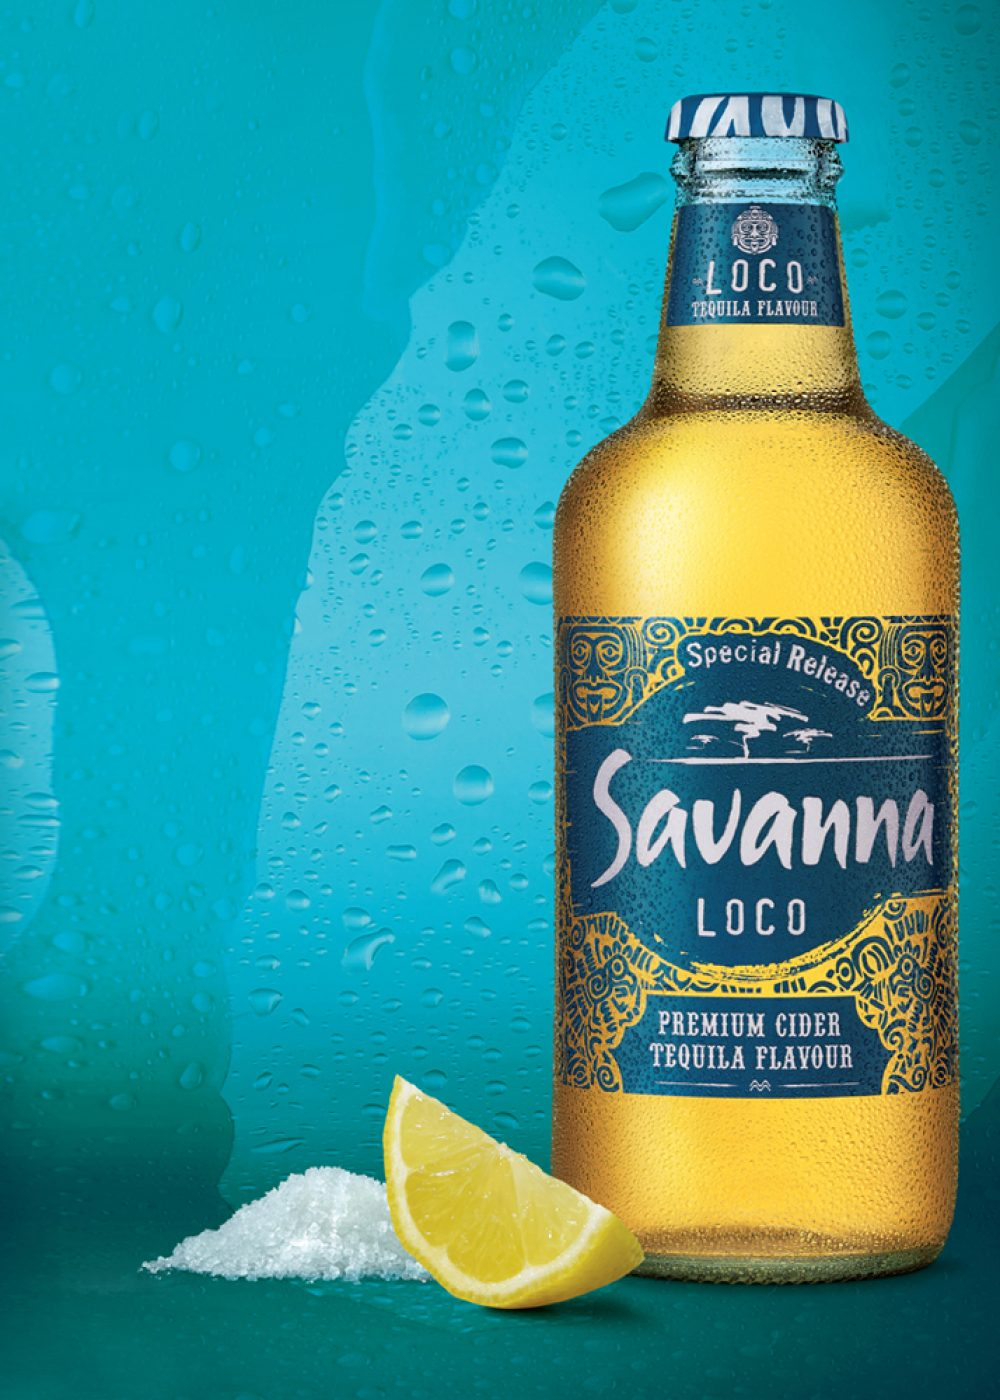 Savanna loco 01